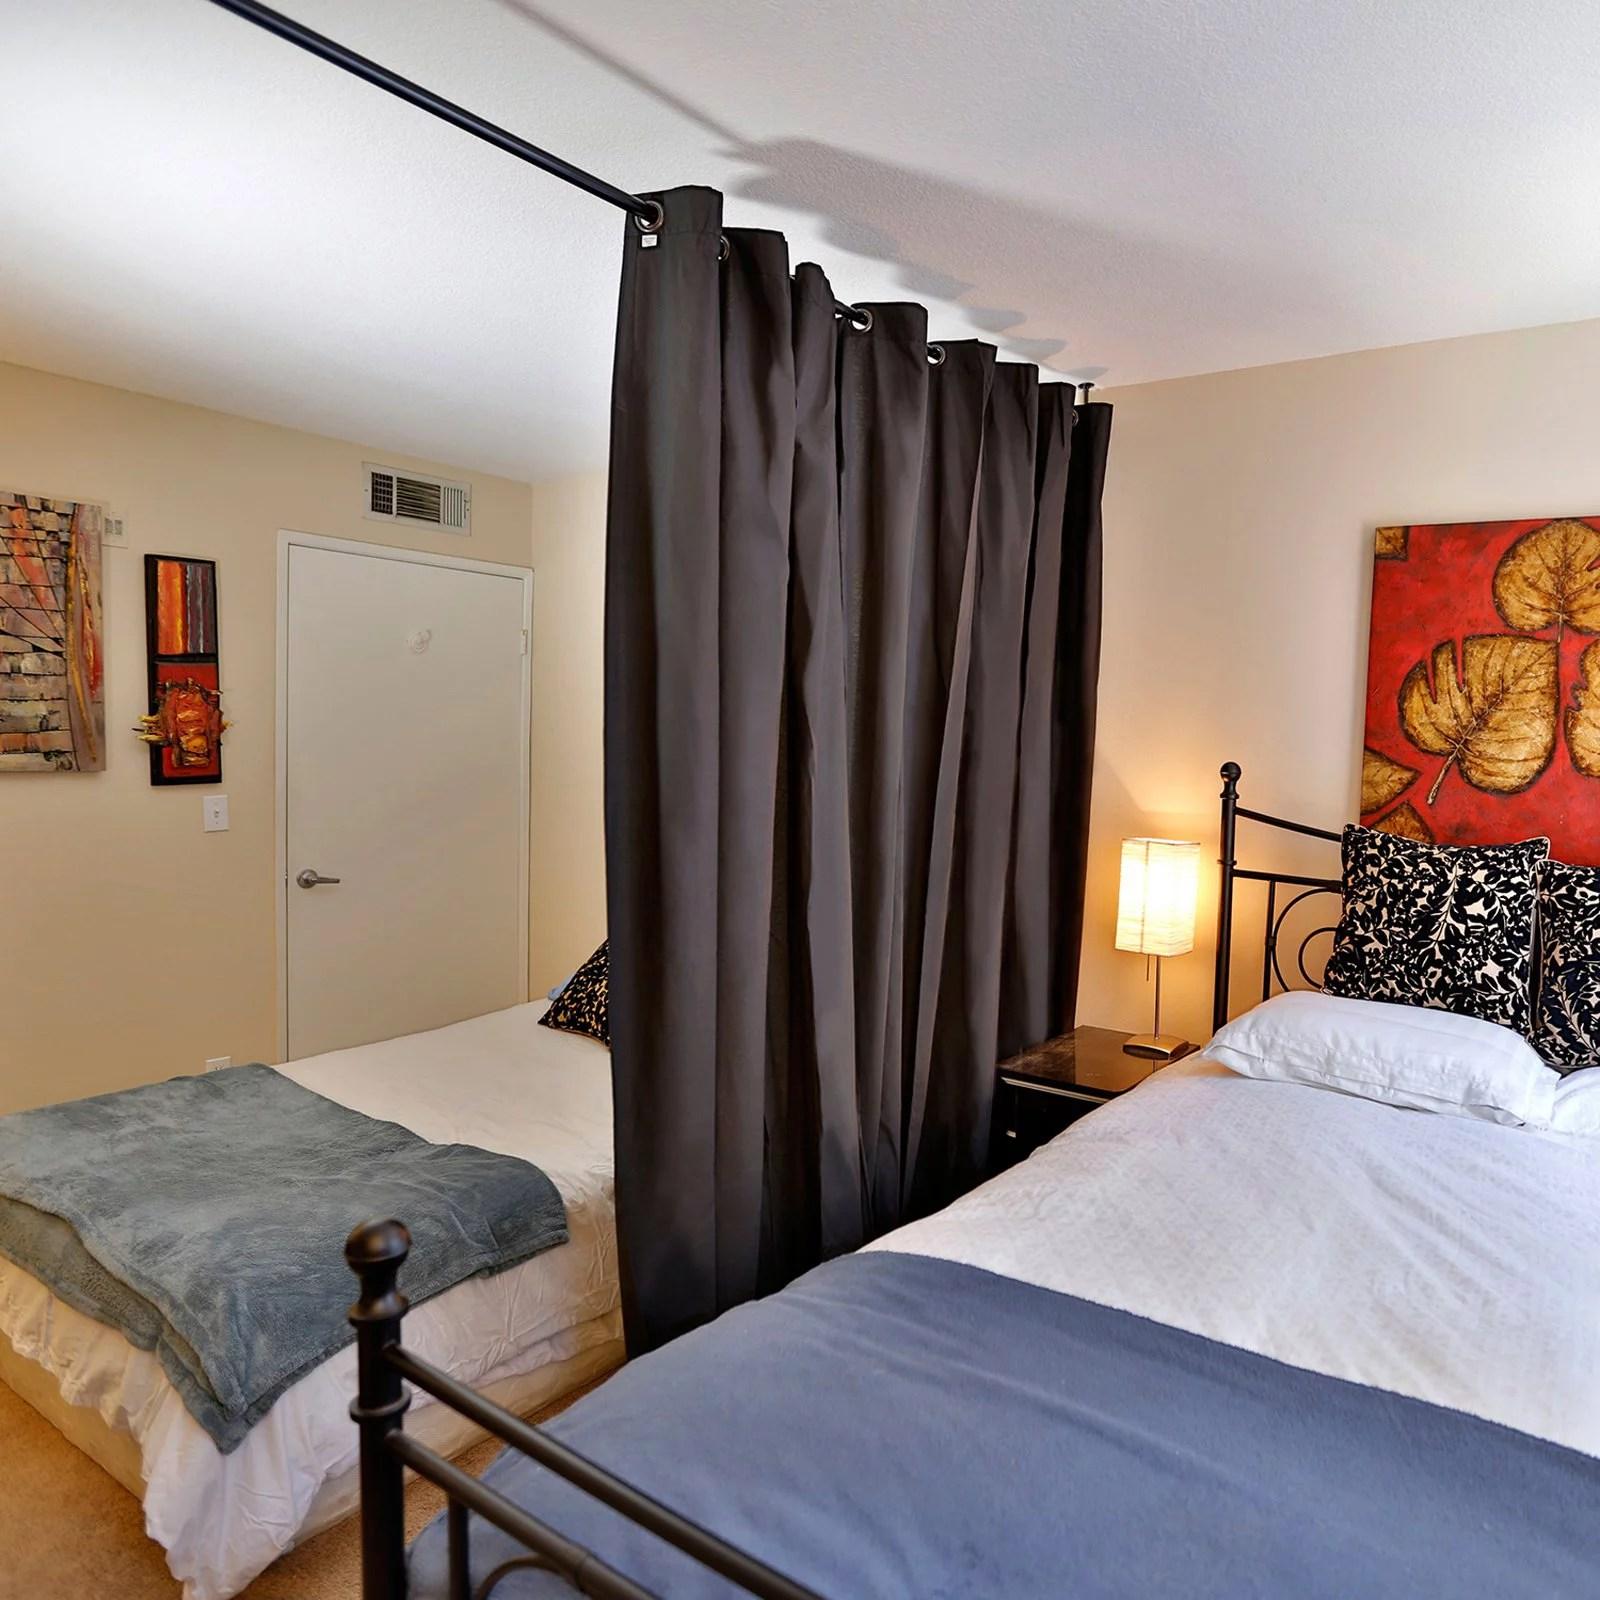 roomdividersnow muslin hanging curtain room divider kit